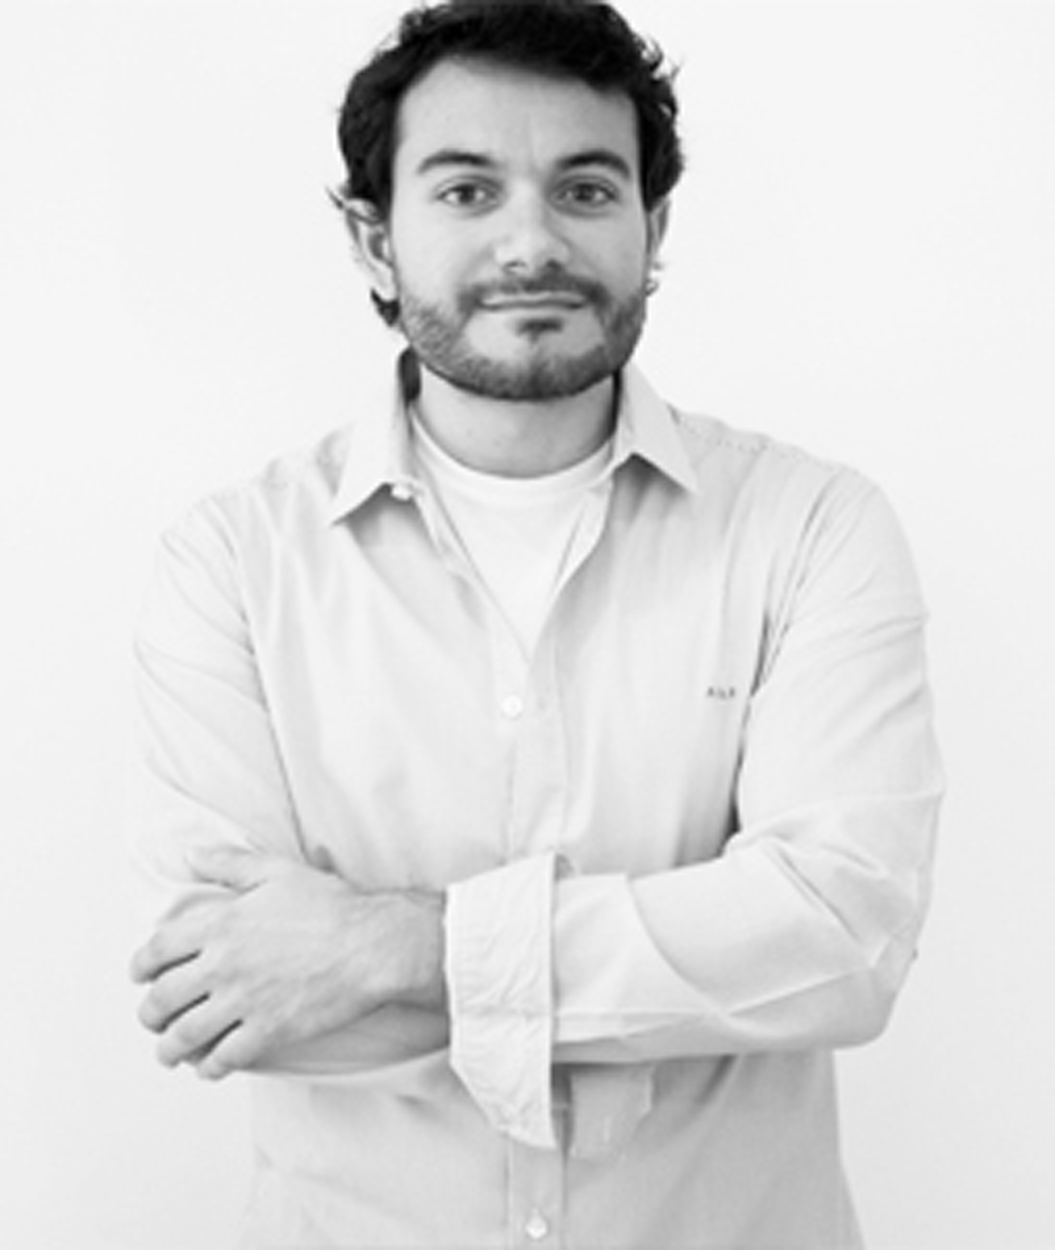 Alberto López Viñau